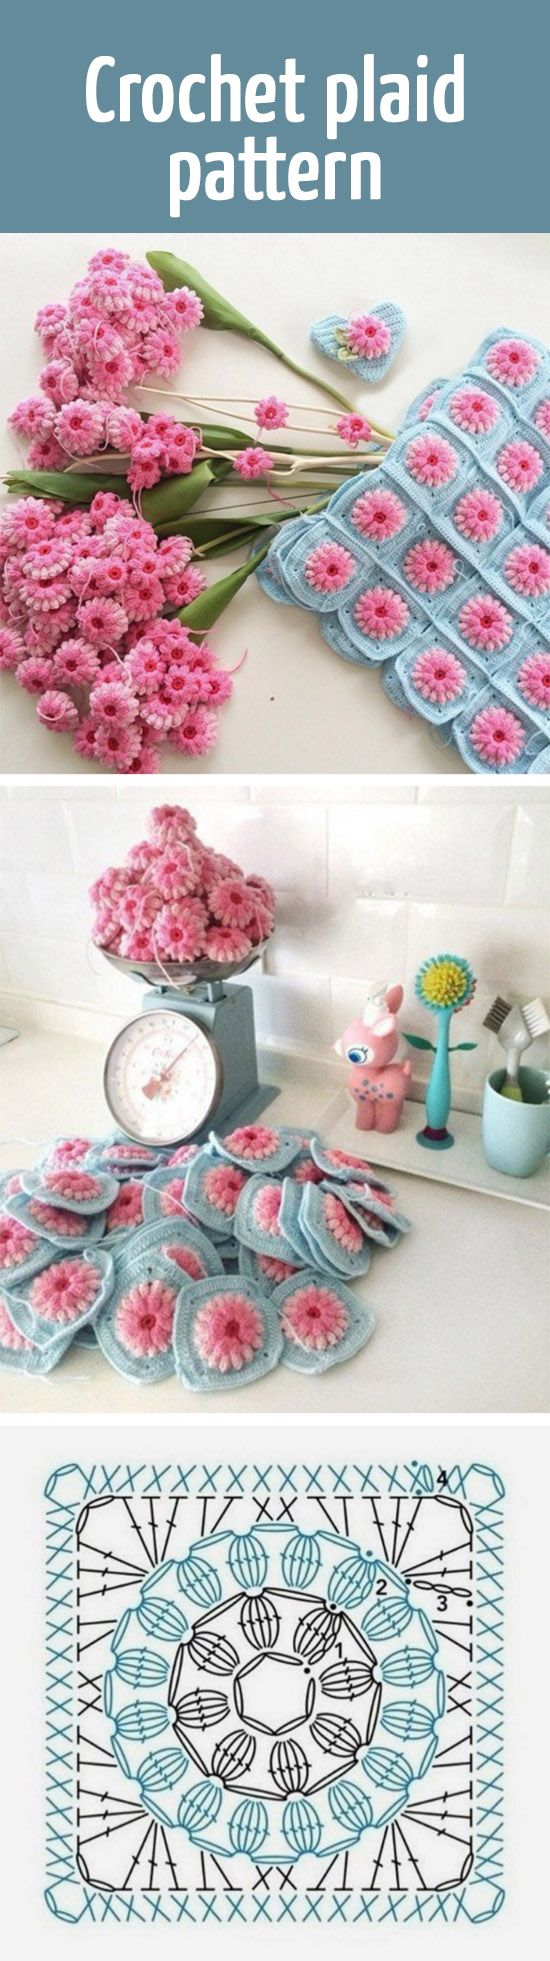 Crochet plaid pattern / вяжем крючком плед из квадратных мотивов …